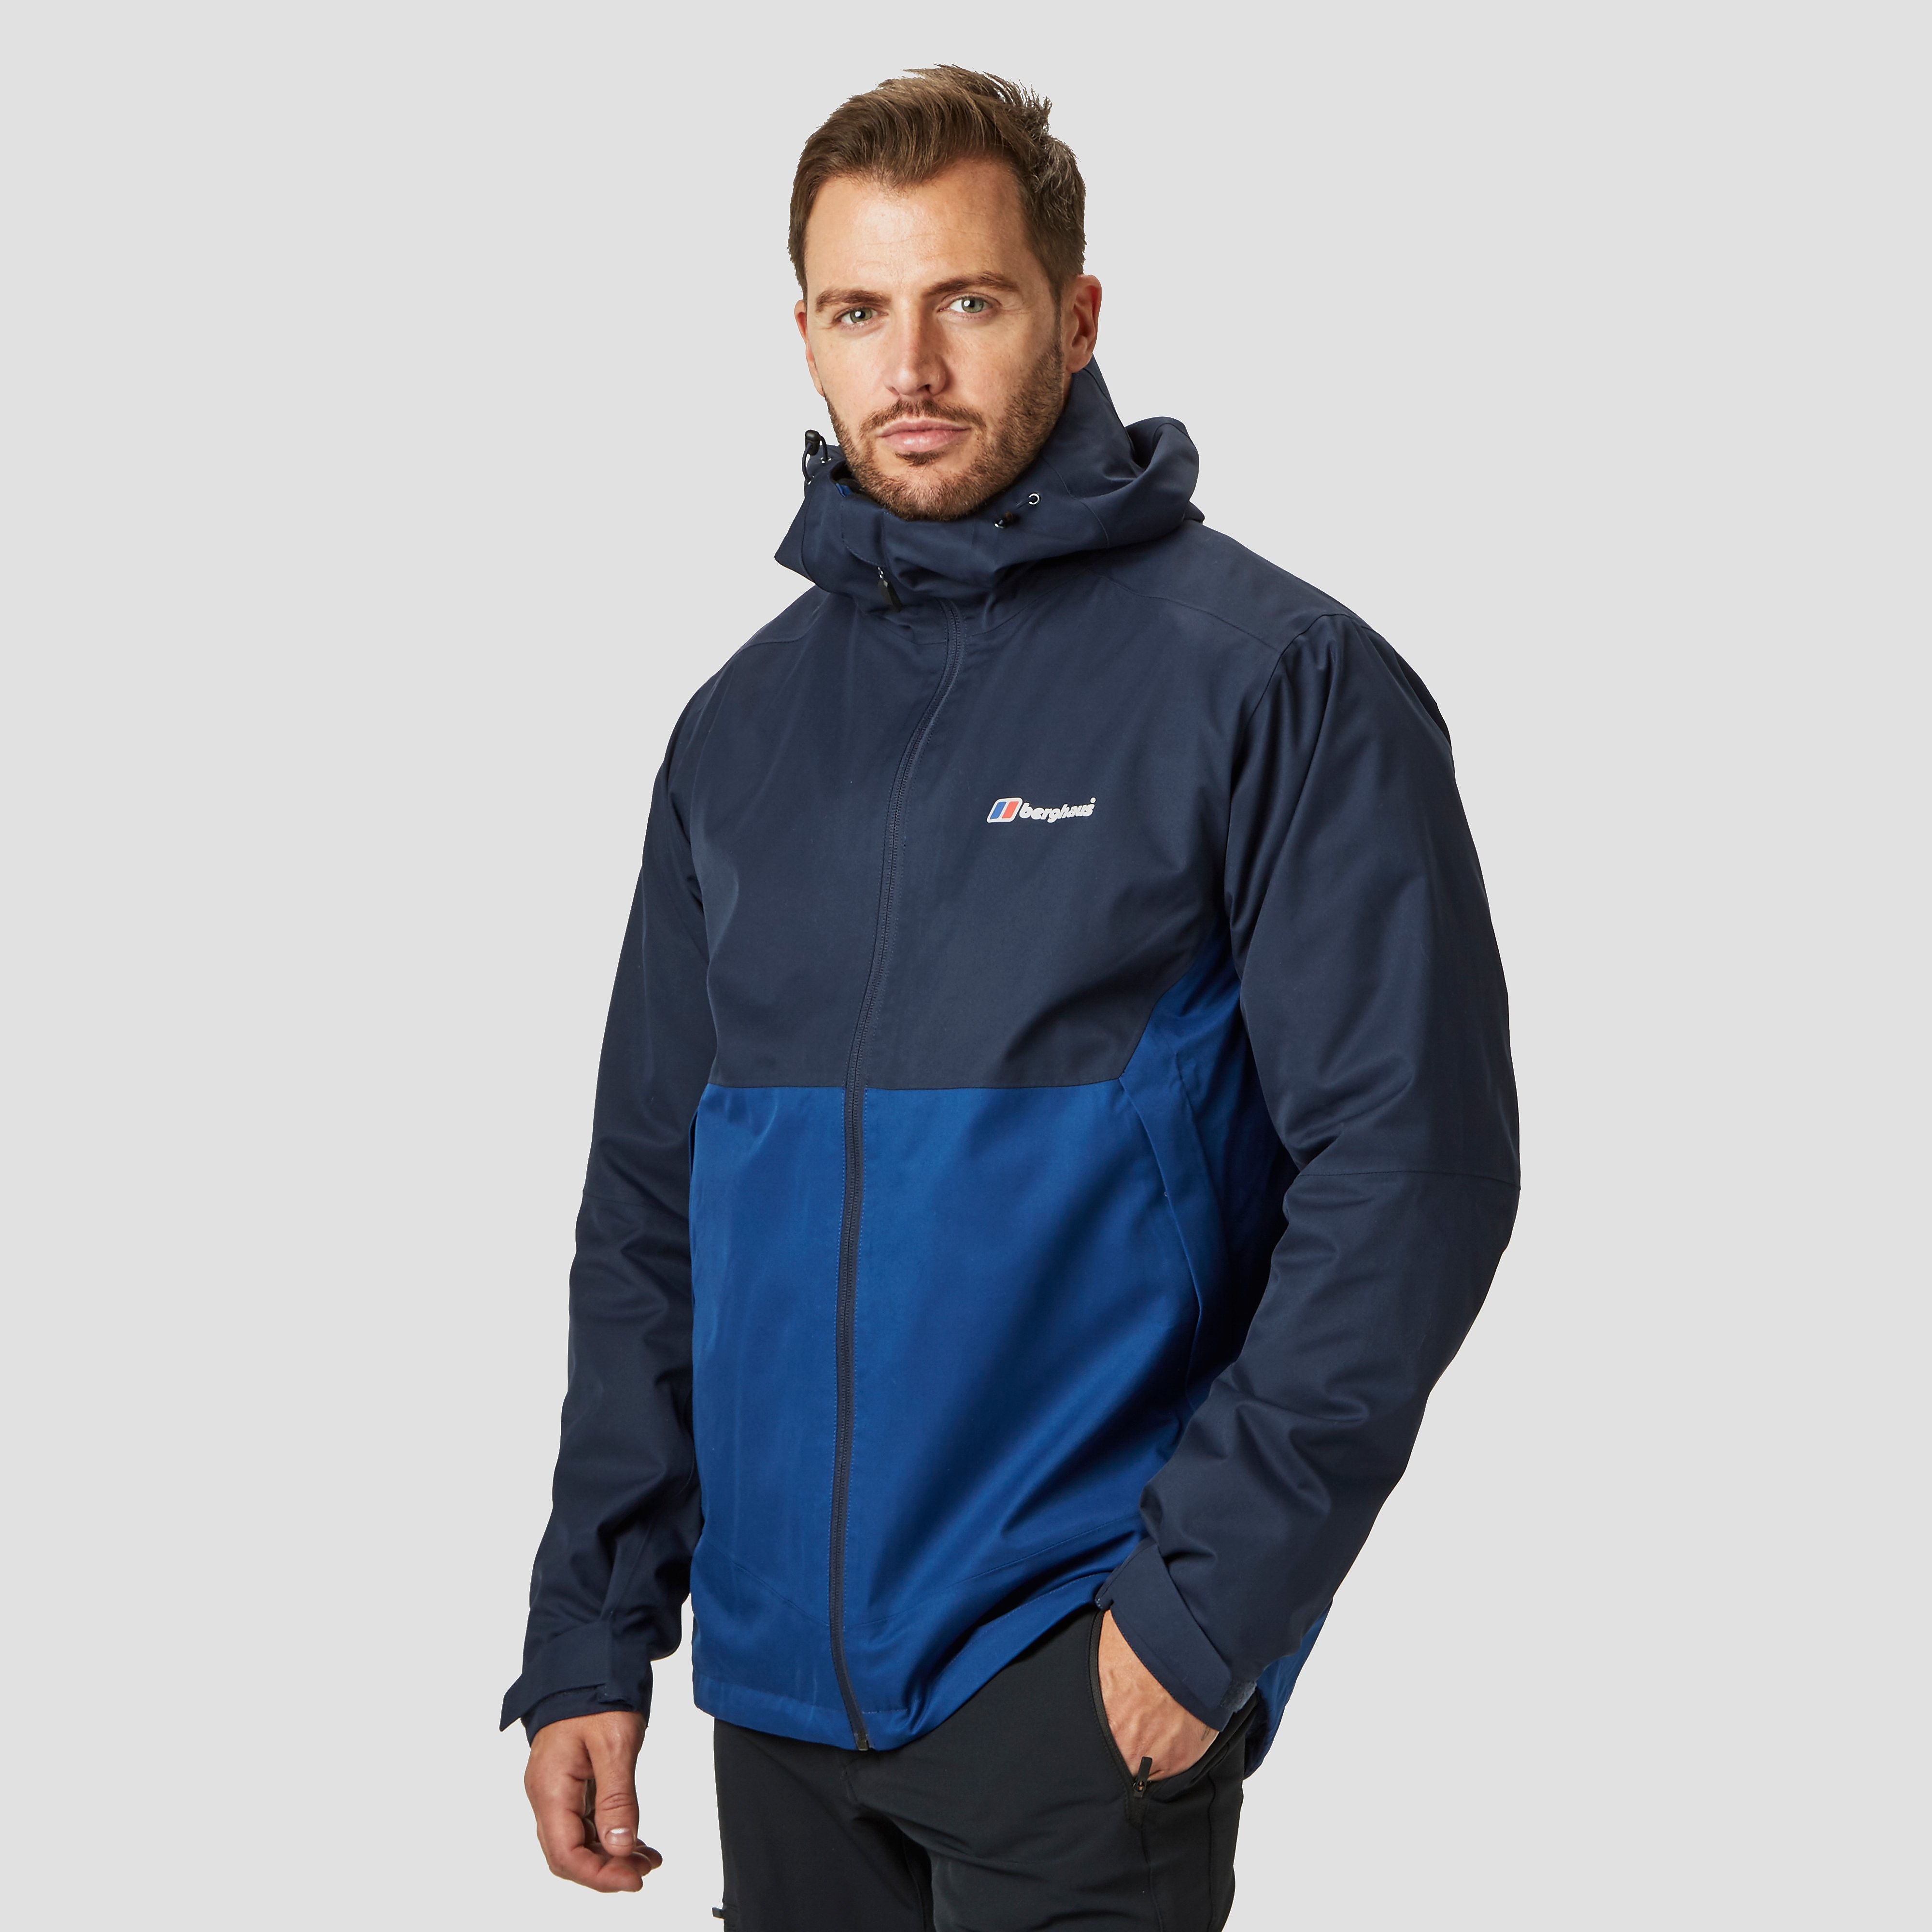 Berghaus Fellmaster GORE-TEX Men's Jacket